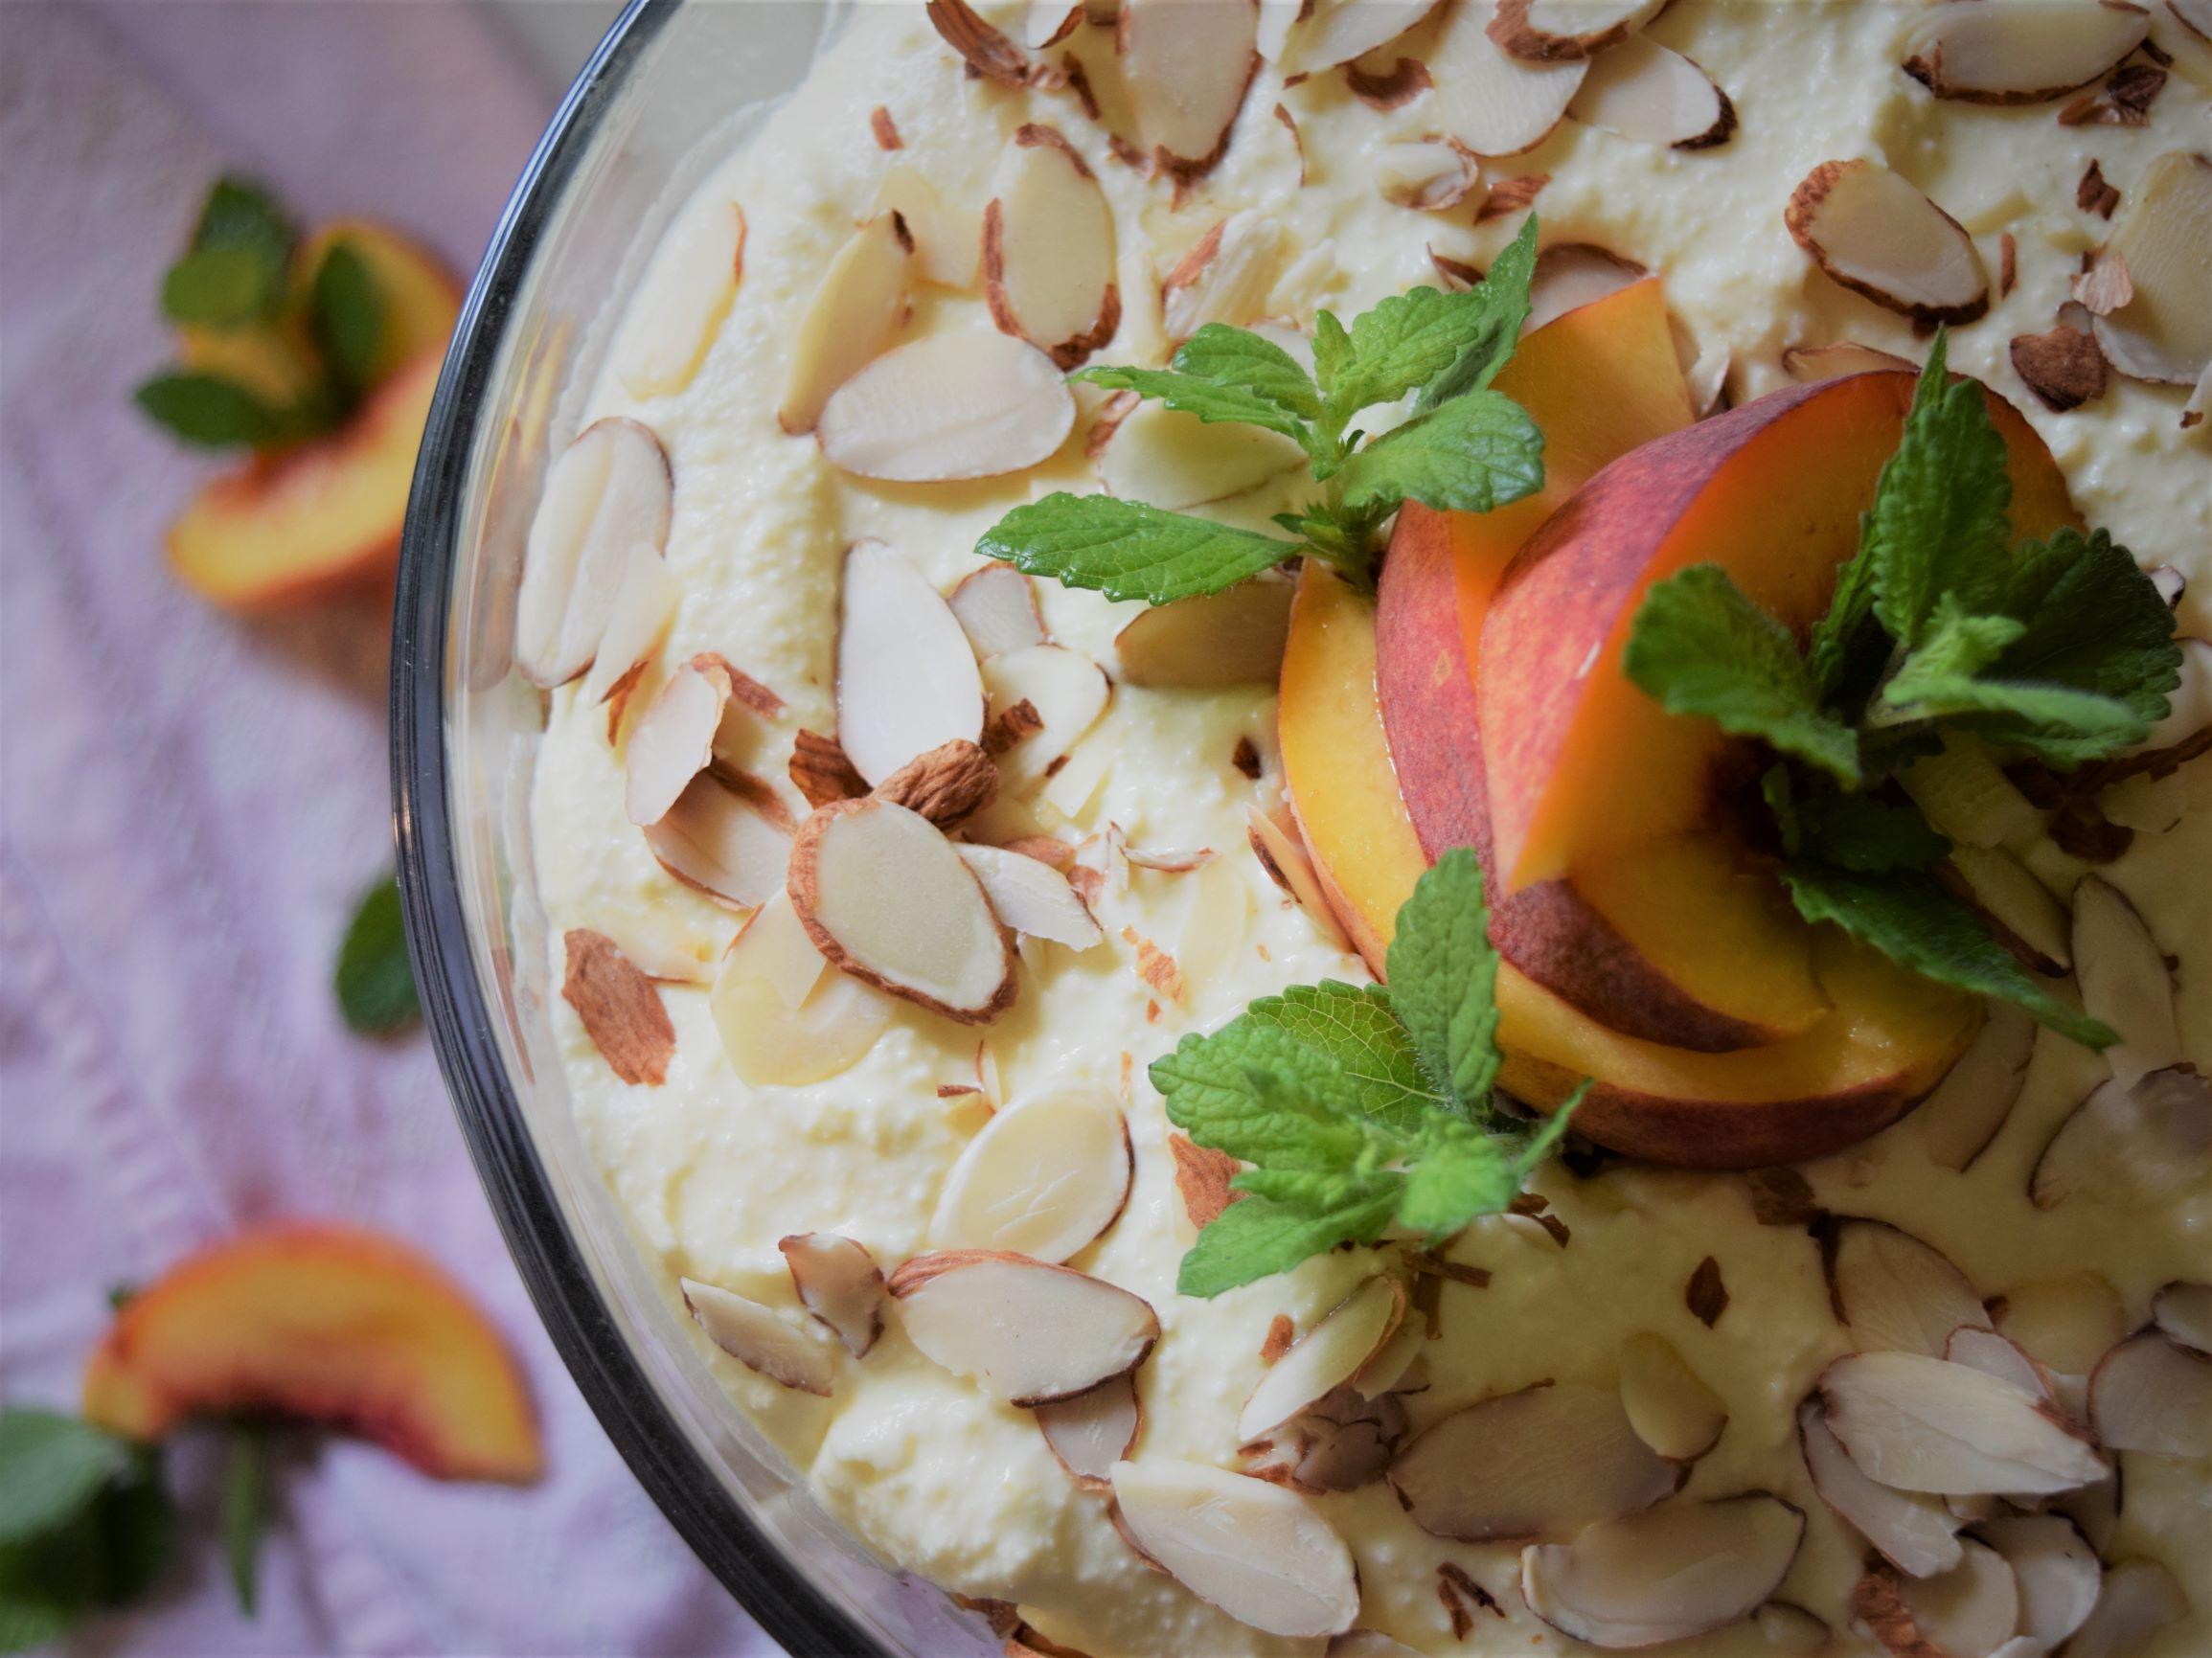 cold peach summer dessert